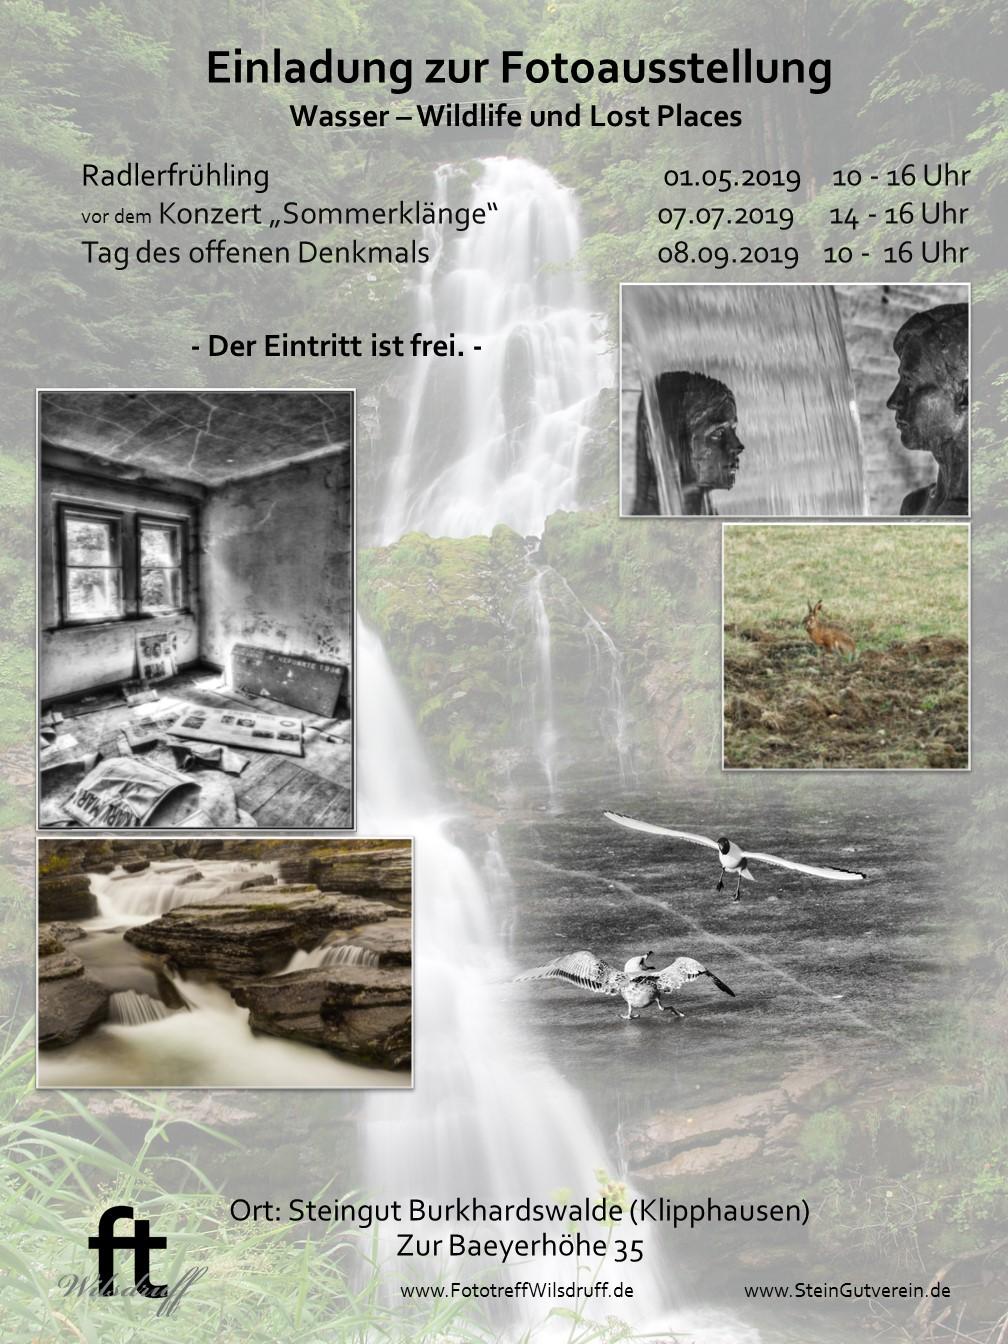 2019_Fotoausstellung_Steingut Burkhardswalde.jpg